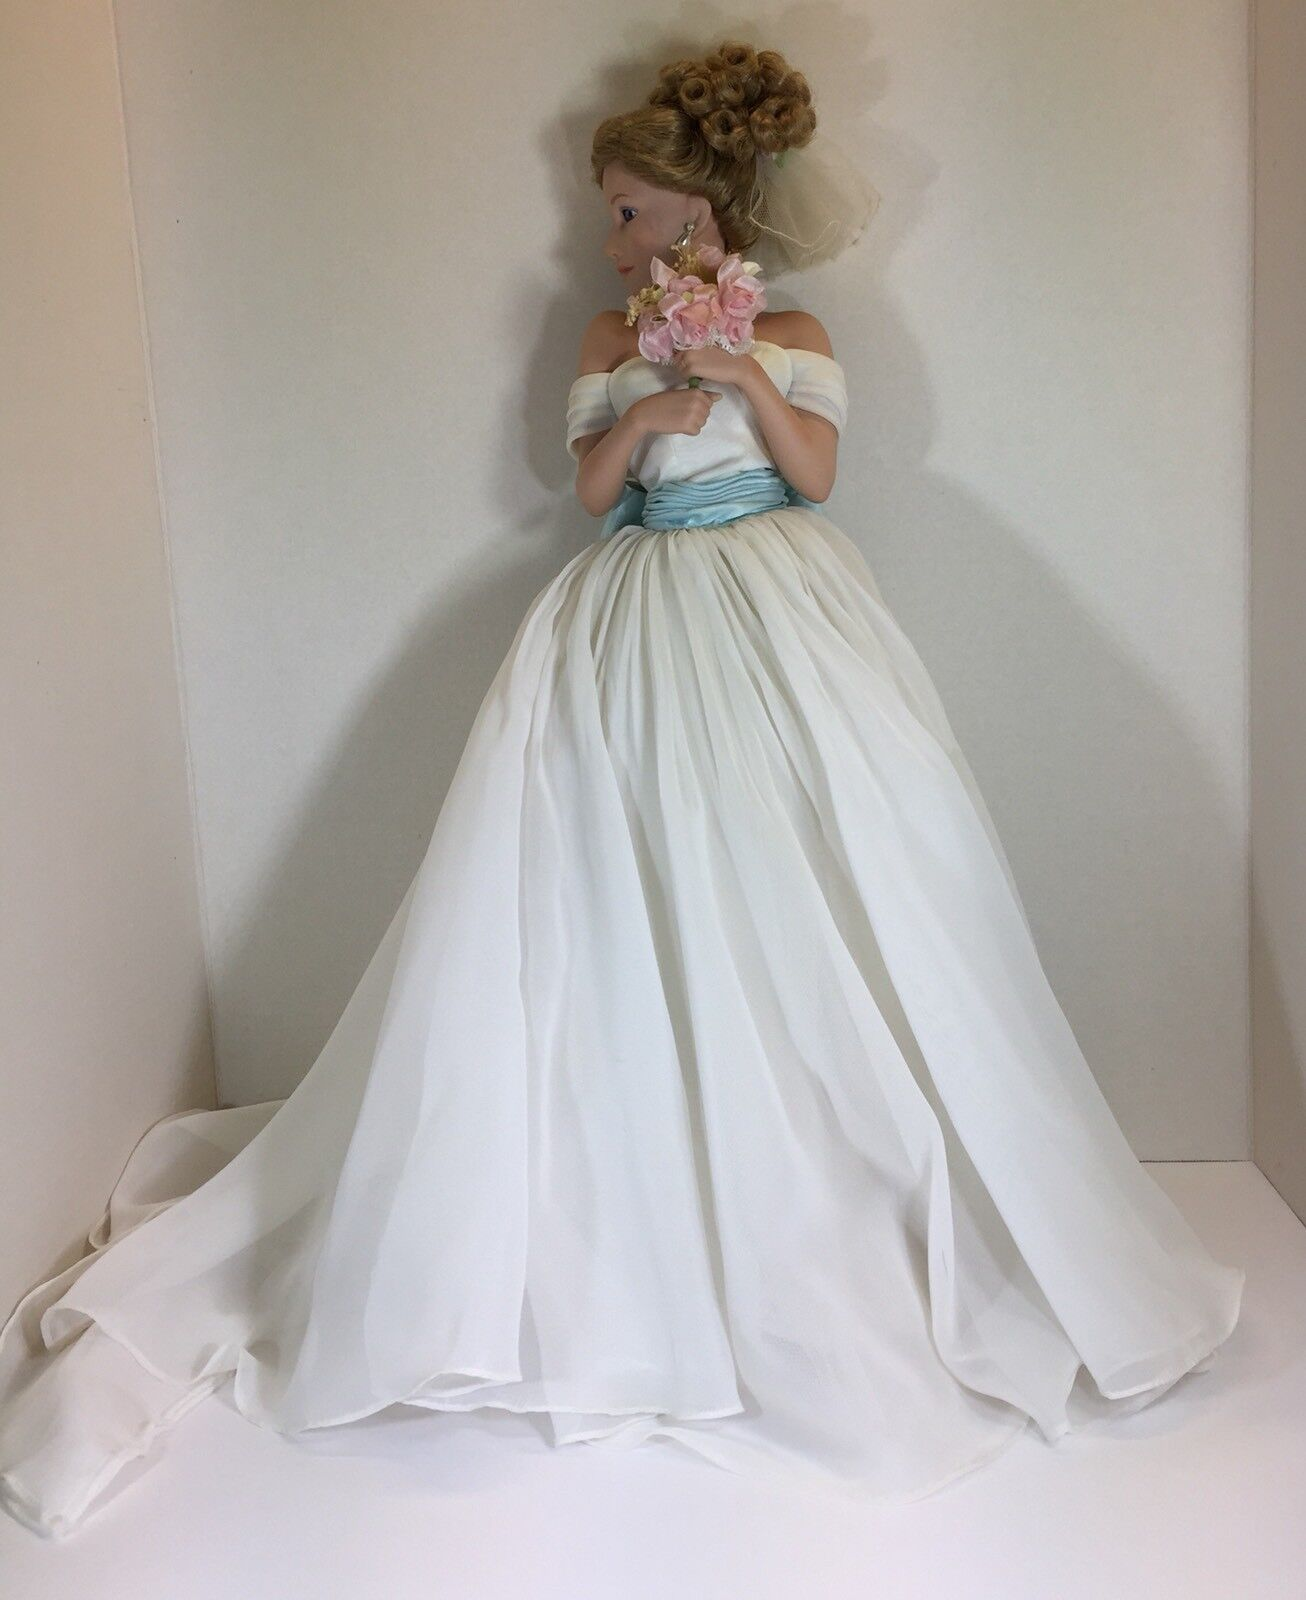 Dolls & Bears Straightforward Berdine Creedy Künstlerpuppe Porzellan Puppe 72 Cm. Dolls